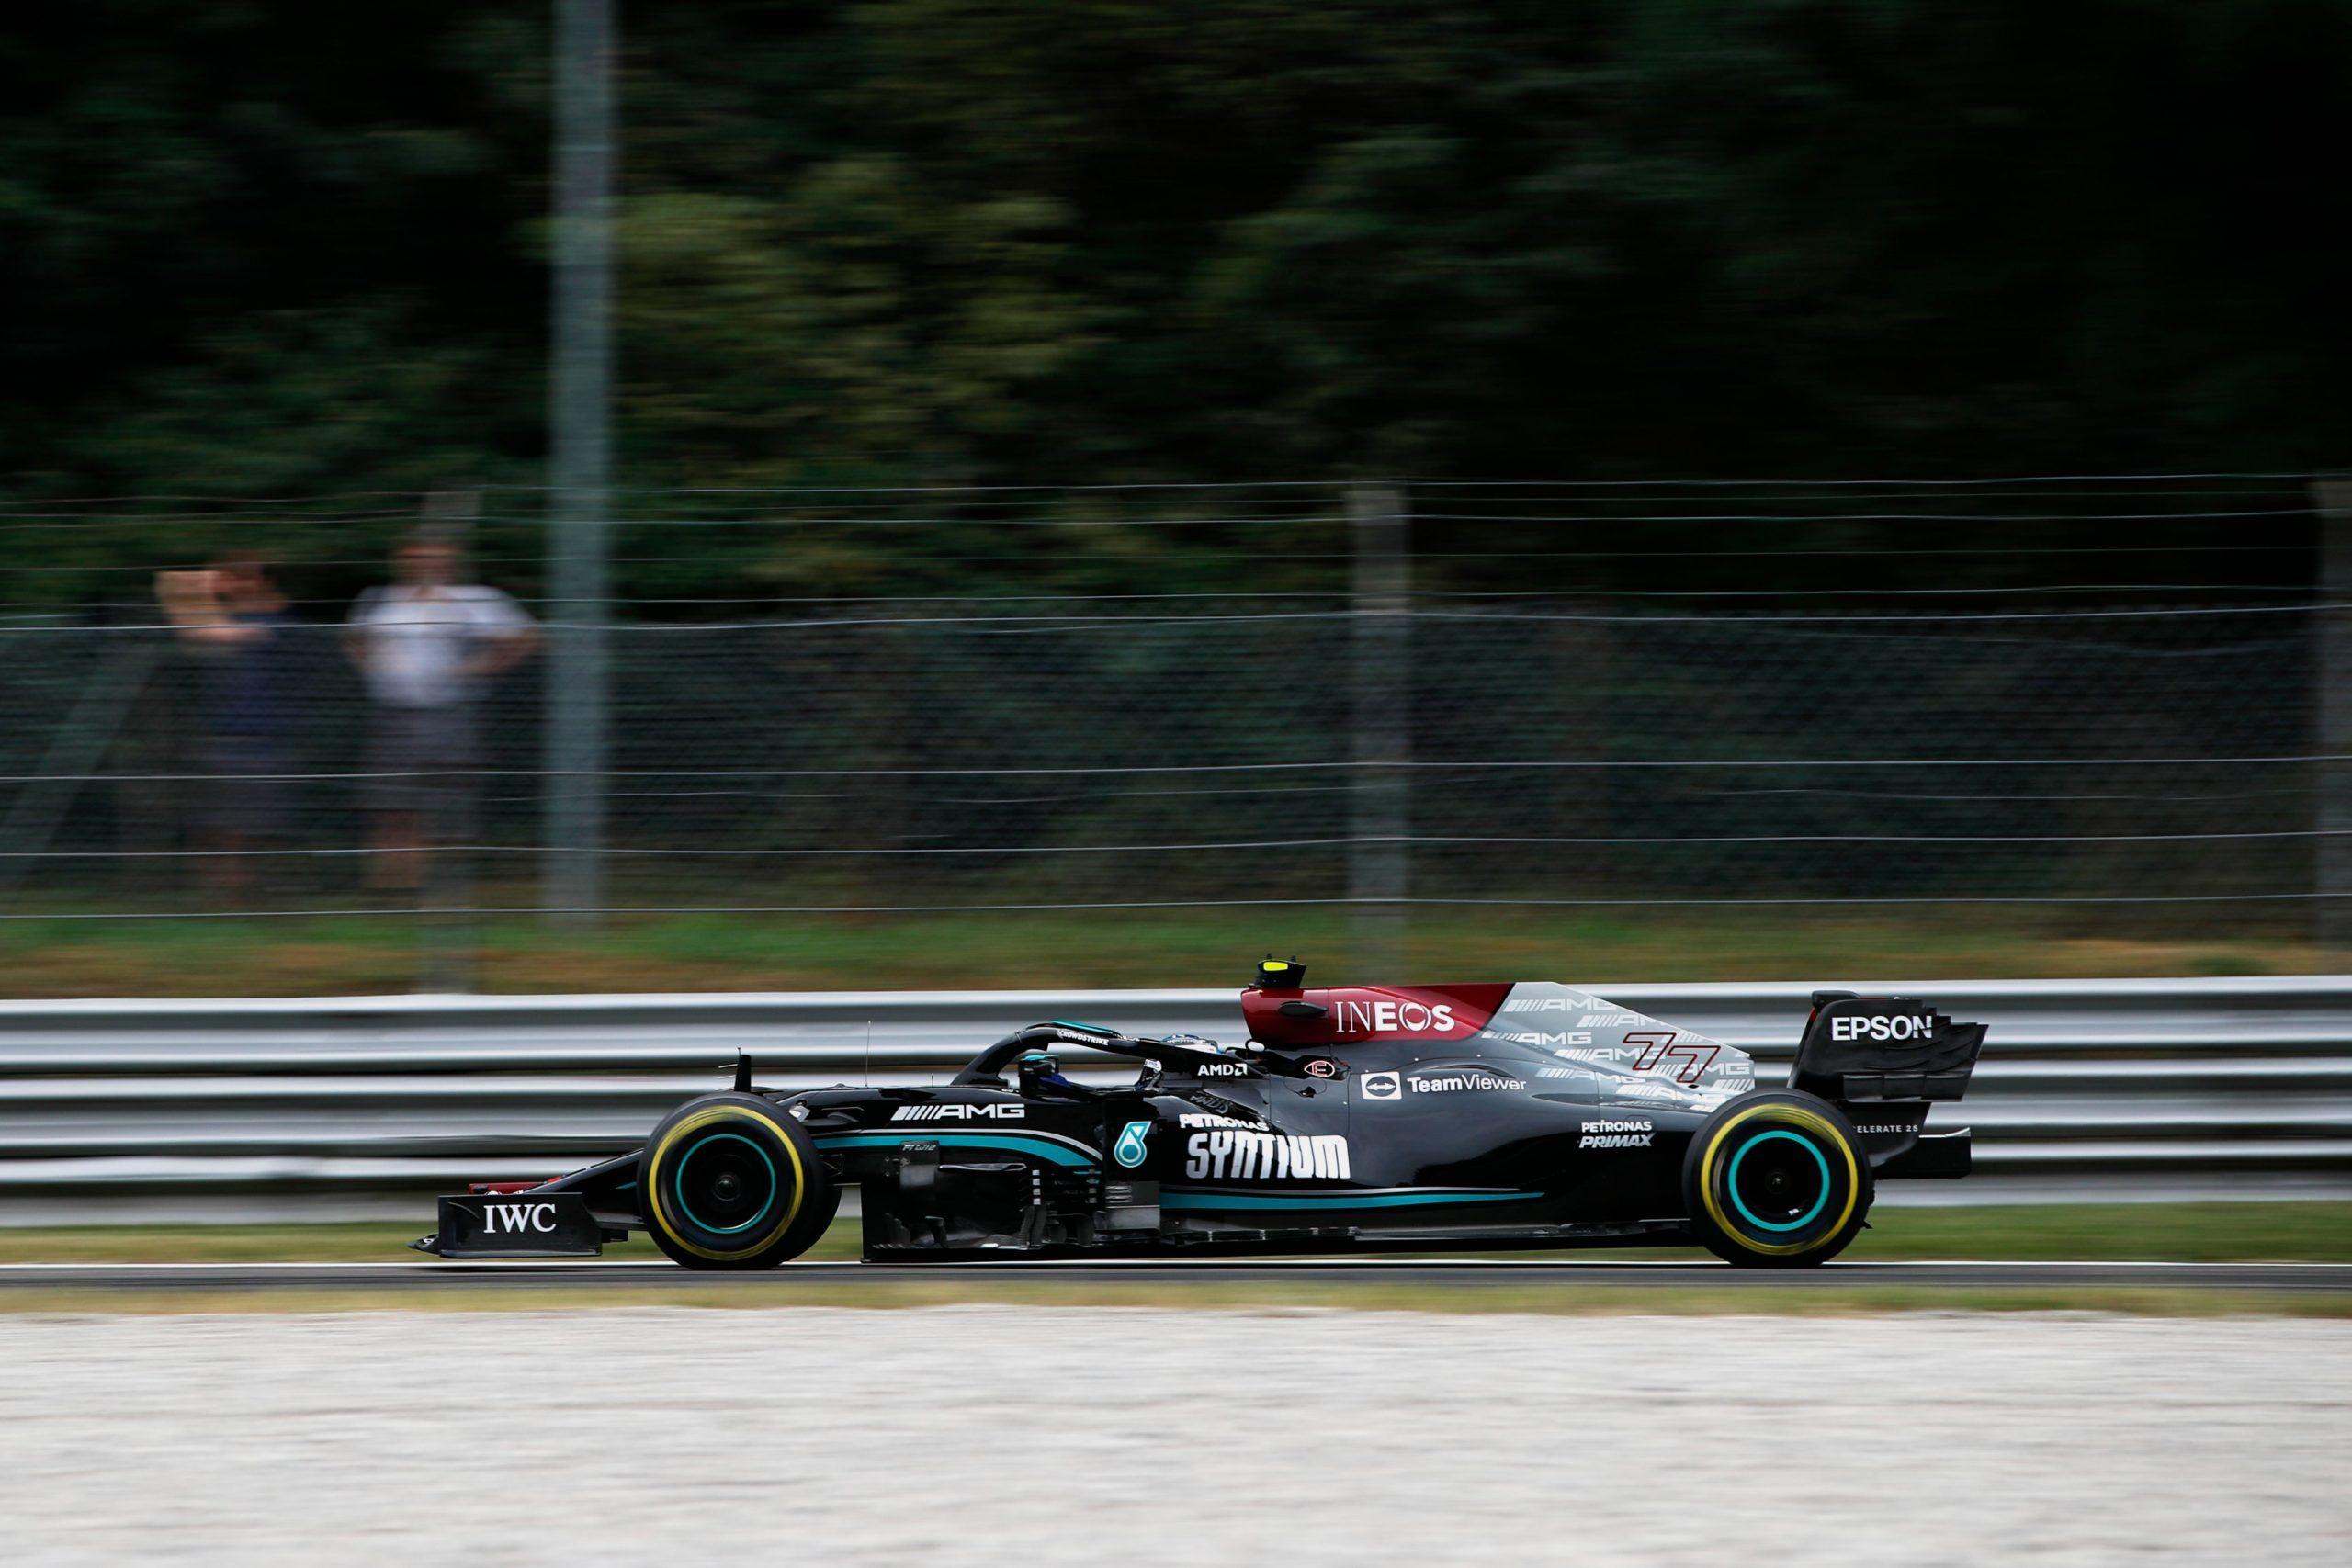 F1, Italian GP, Valtteri Bottas